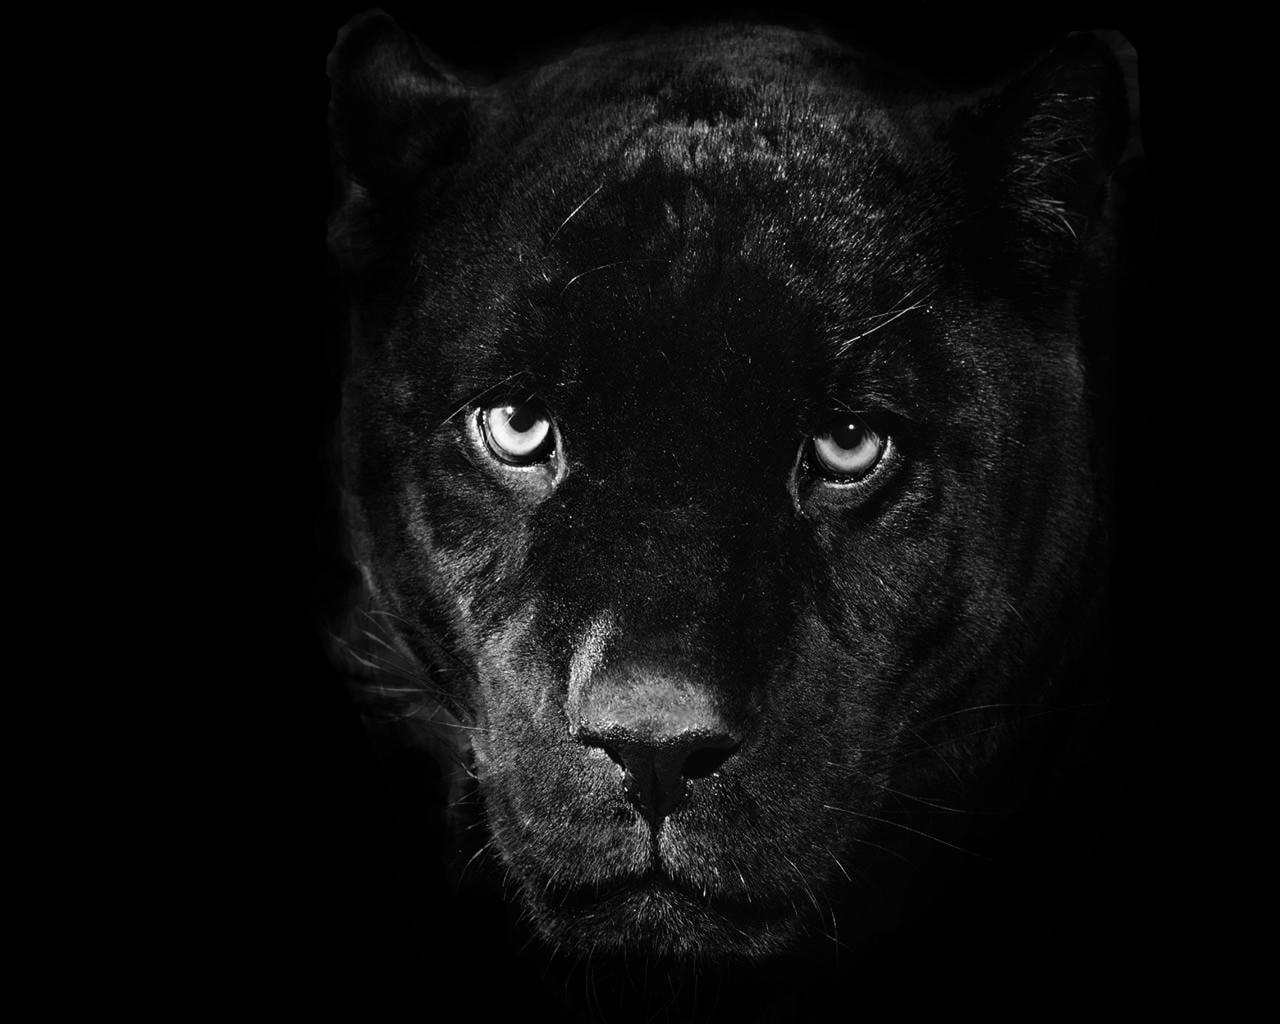 Panther PNG - 8083